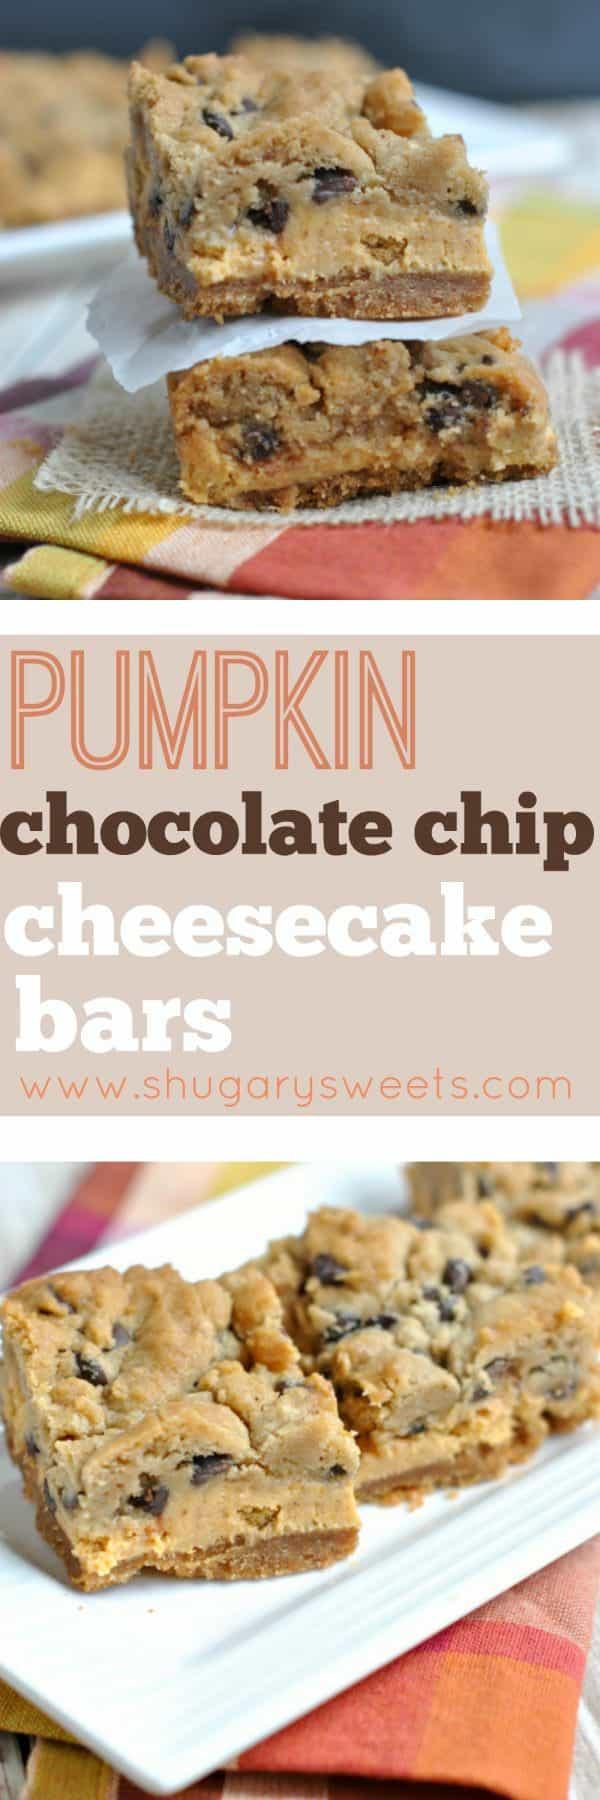 Pumpkin Chocolate Chip Cheesecake Bars - Shugary Sweets